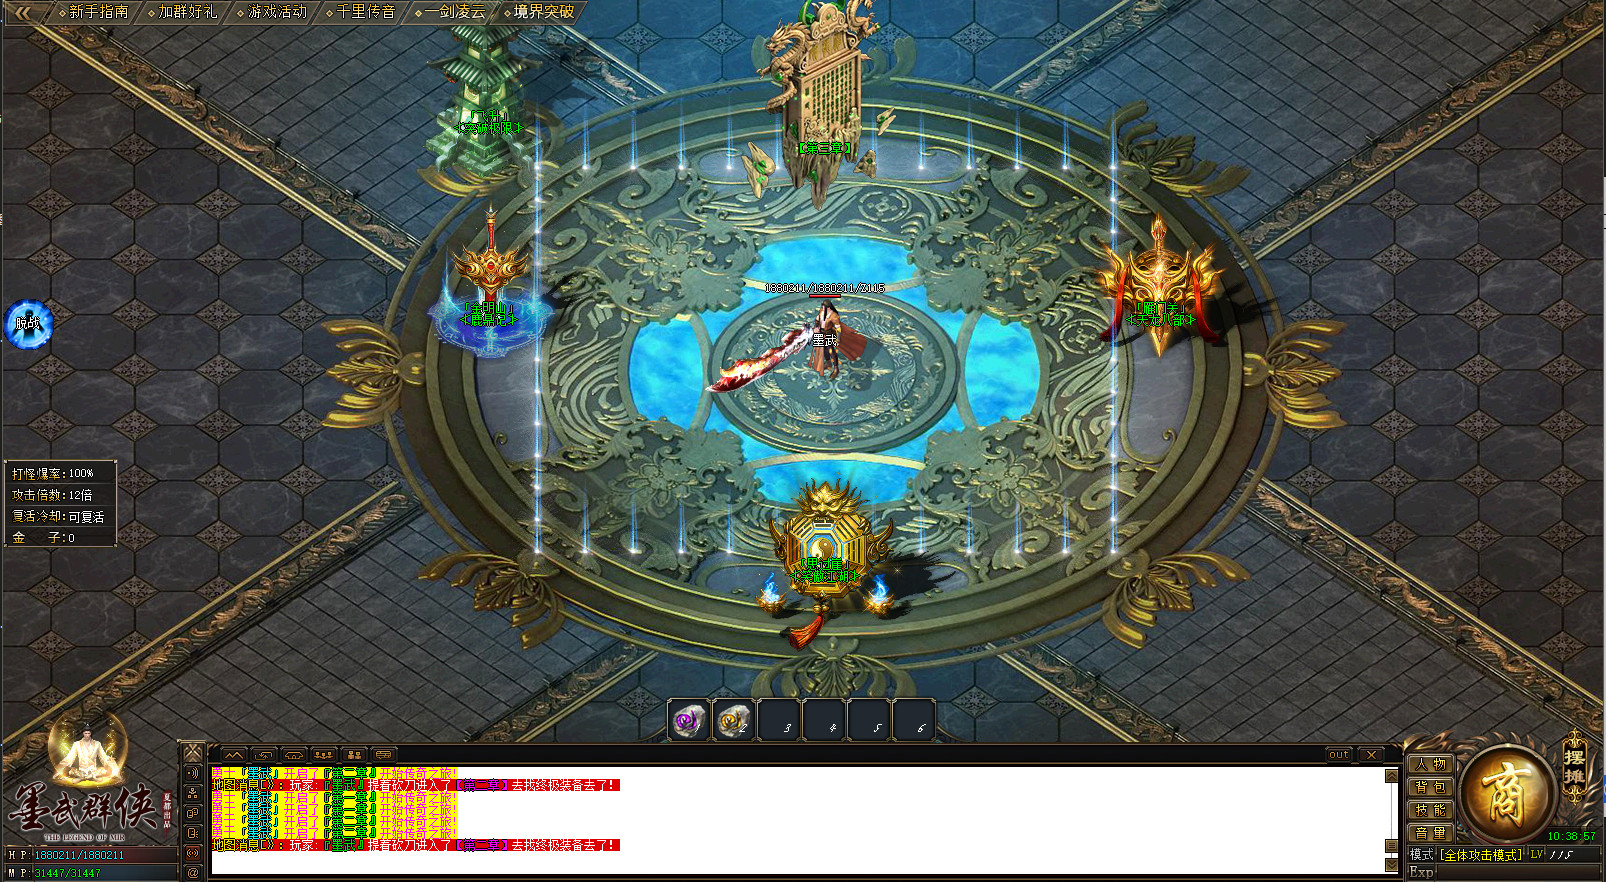 墨武群侠(Tale of MoWu) screenshot